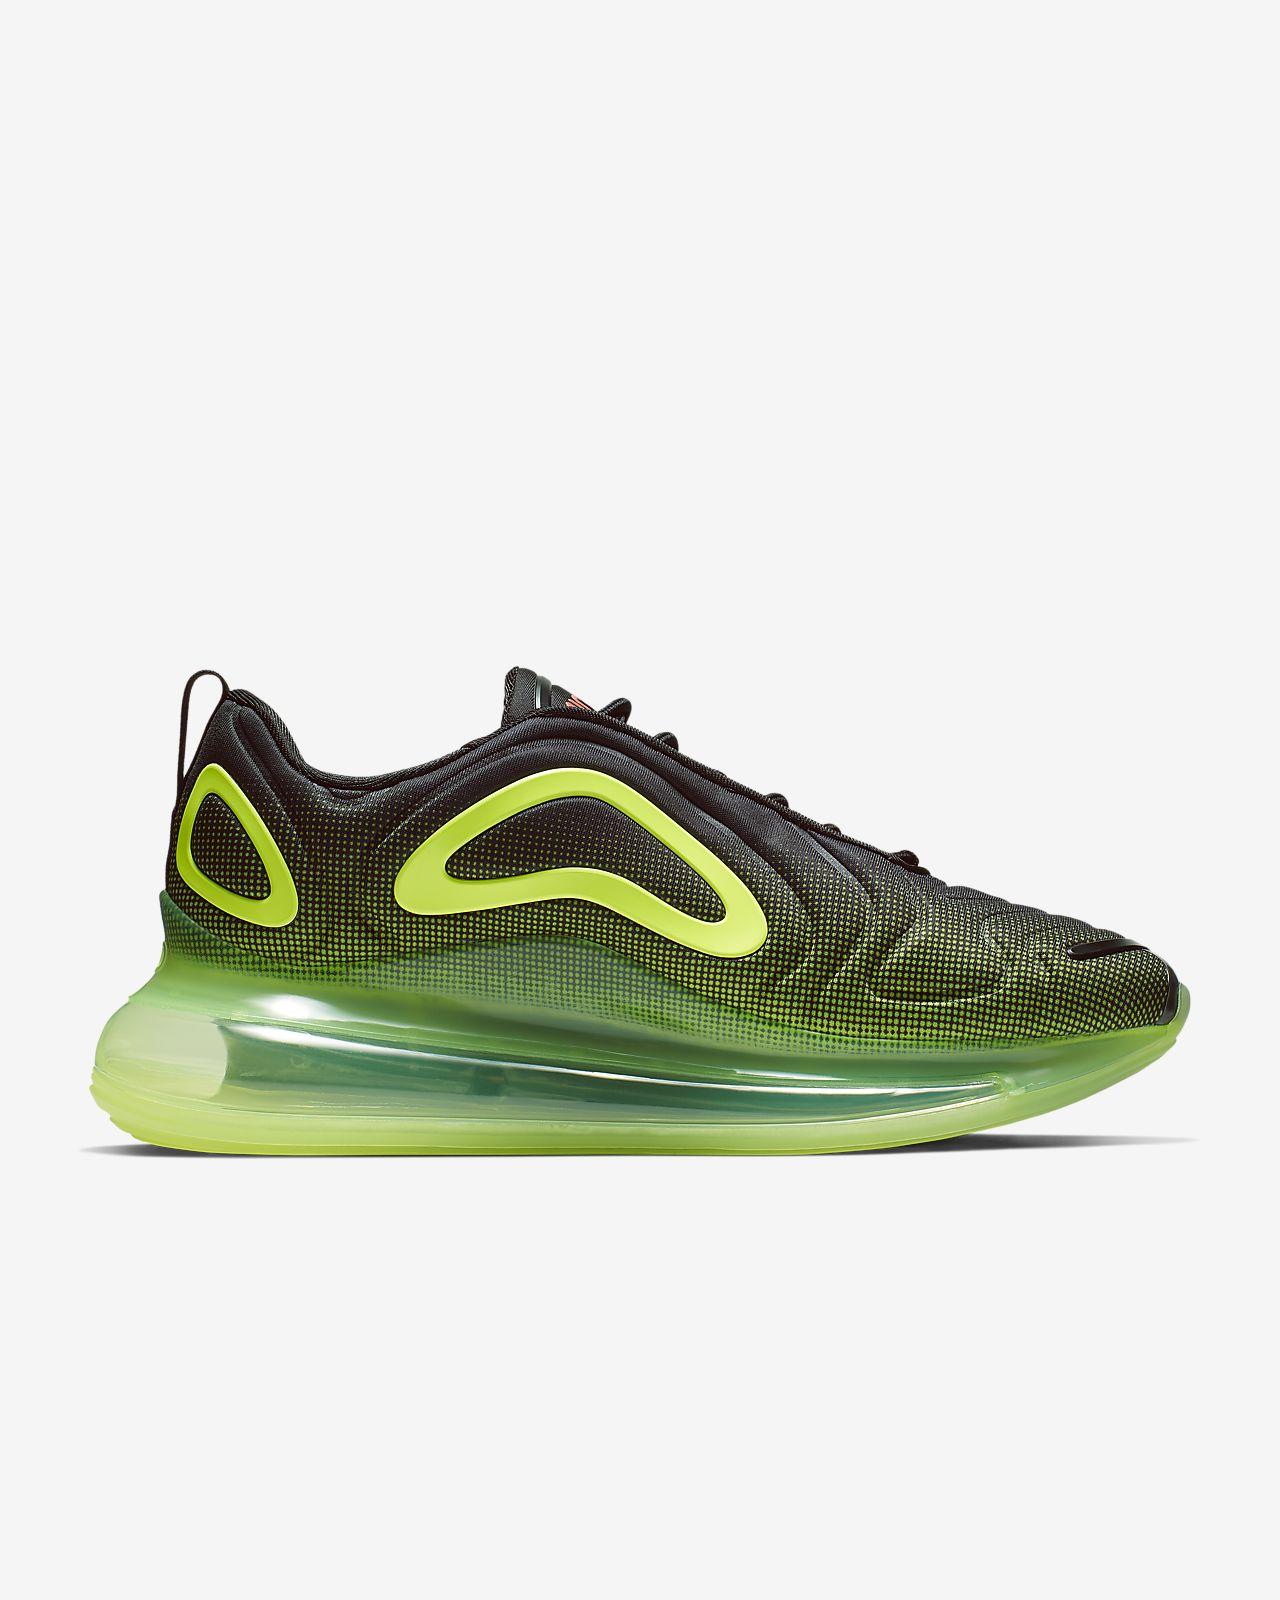 sports shoes 731b9 beba9 ... Chaussure Nike Air Max 720 pour Homme